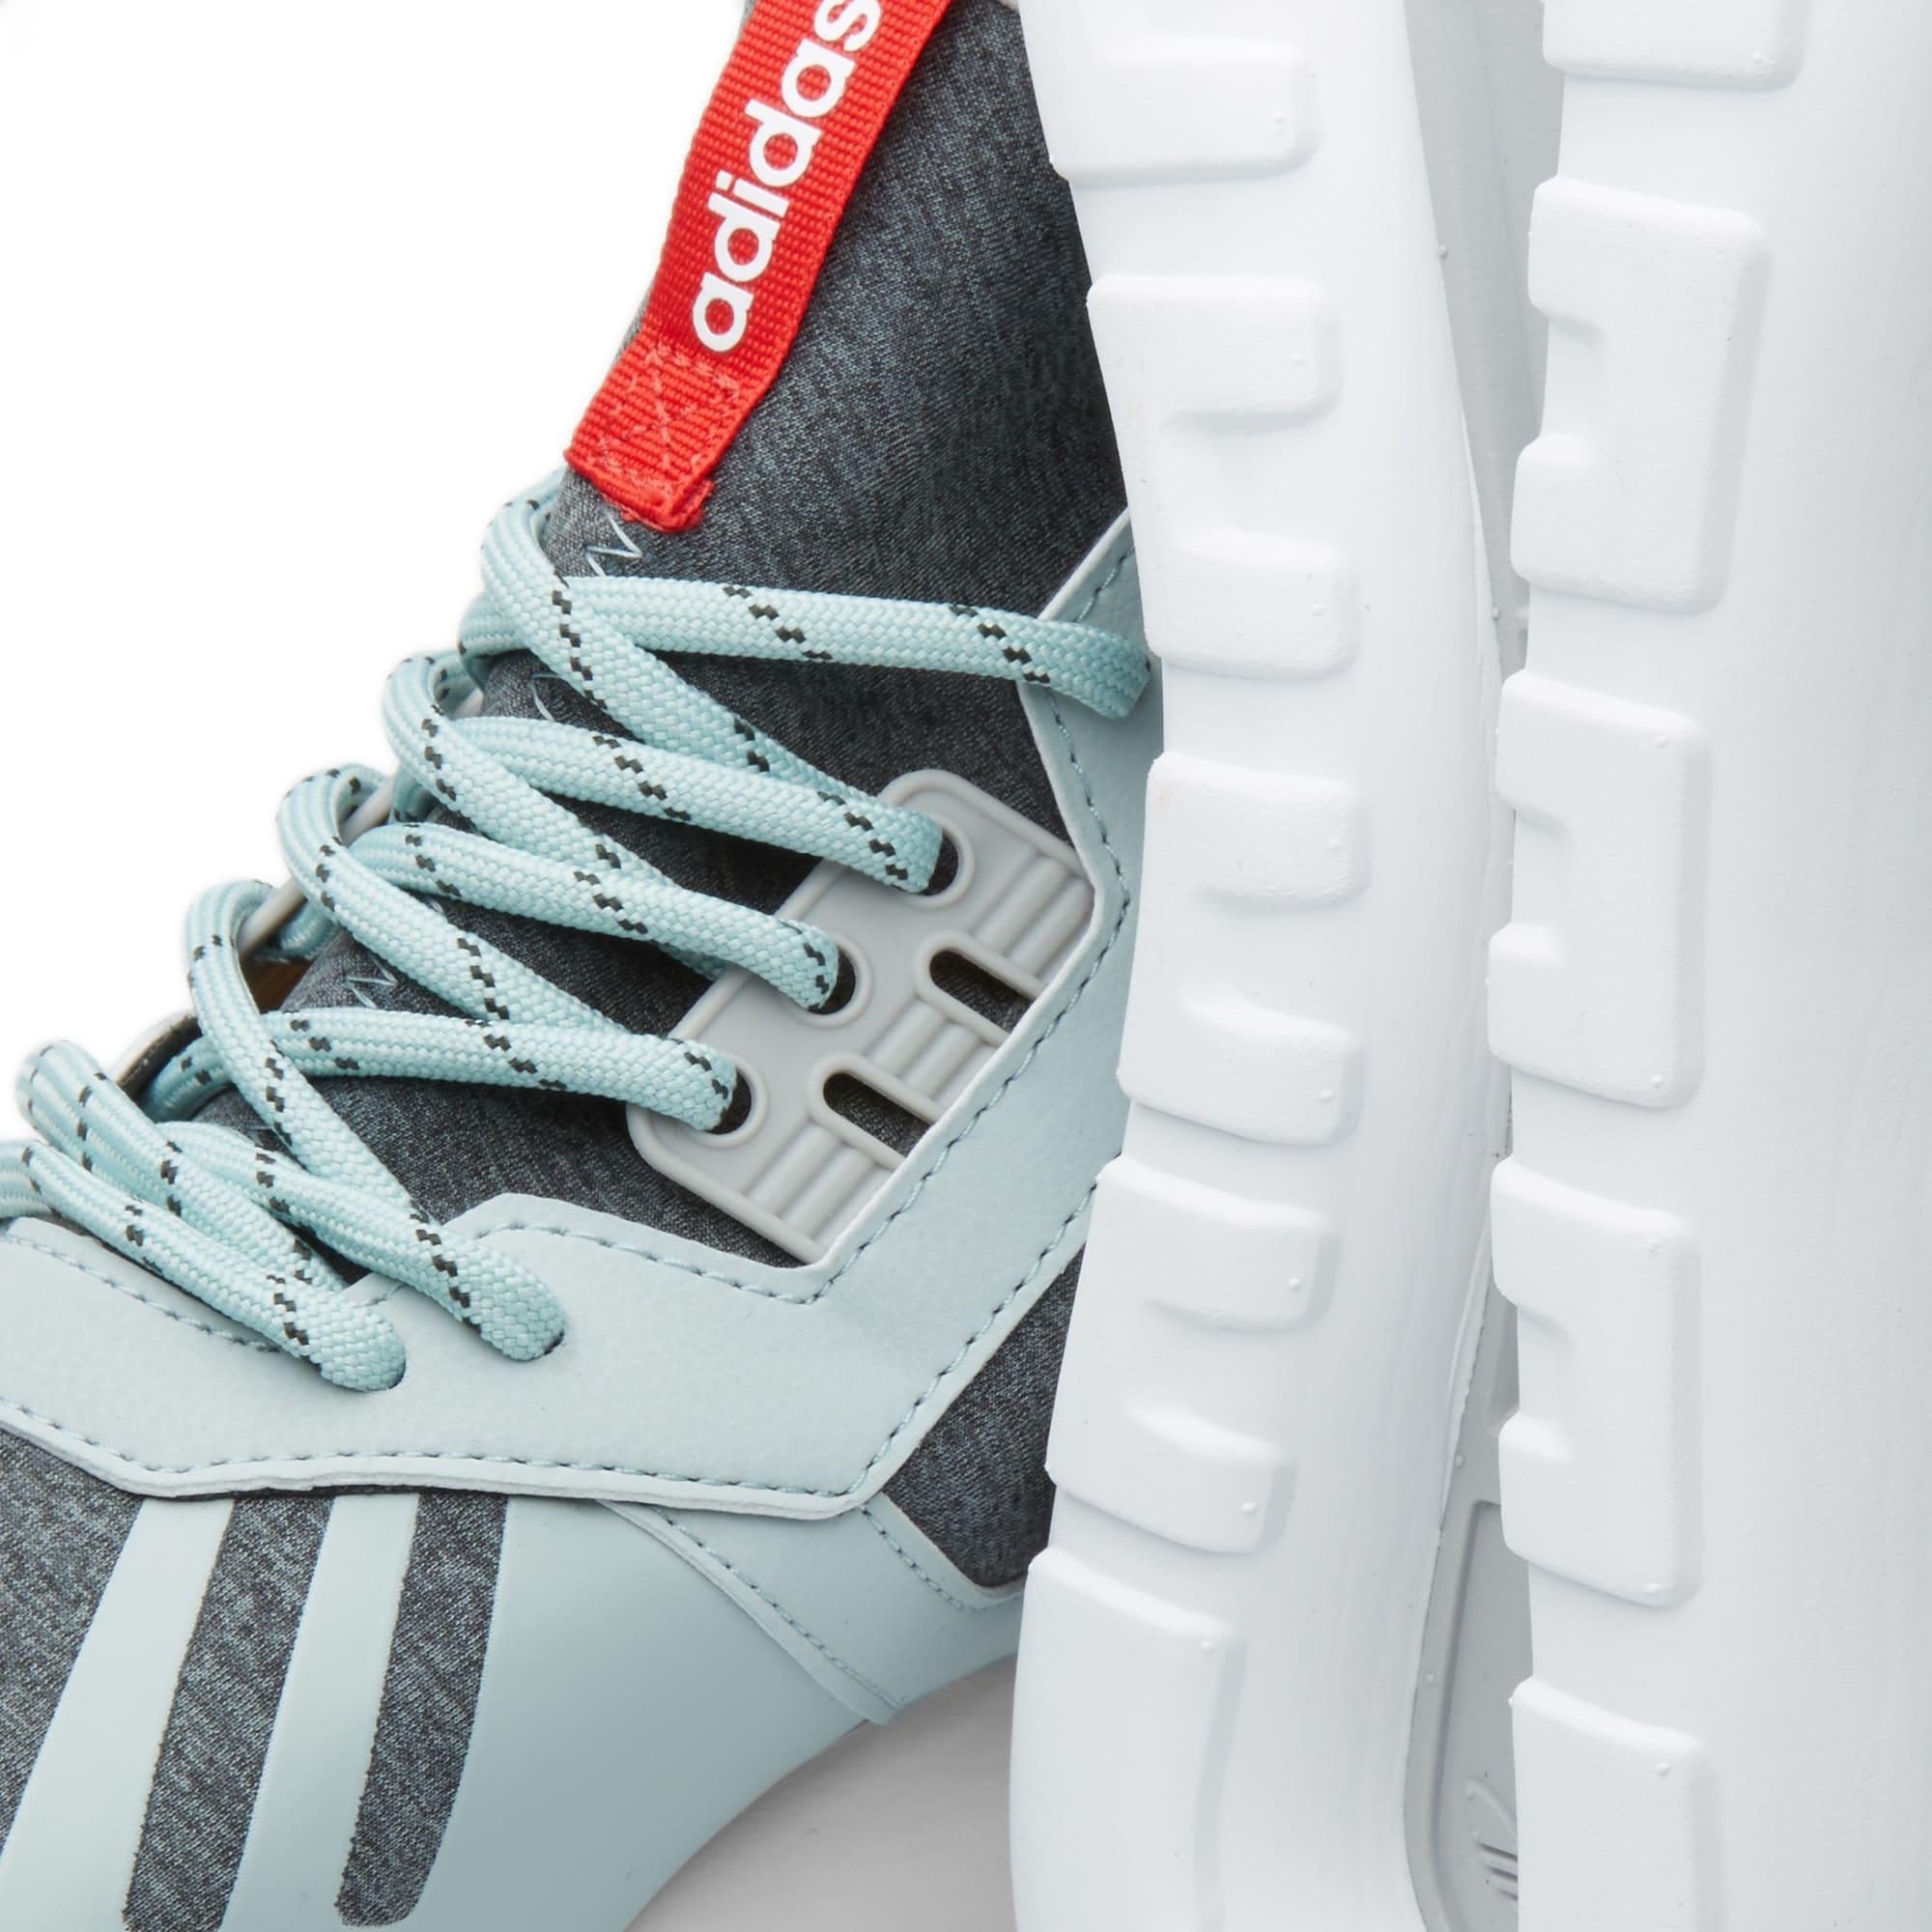 competitive price 2b2fb 6886b Adidas Tubular Runner Weave